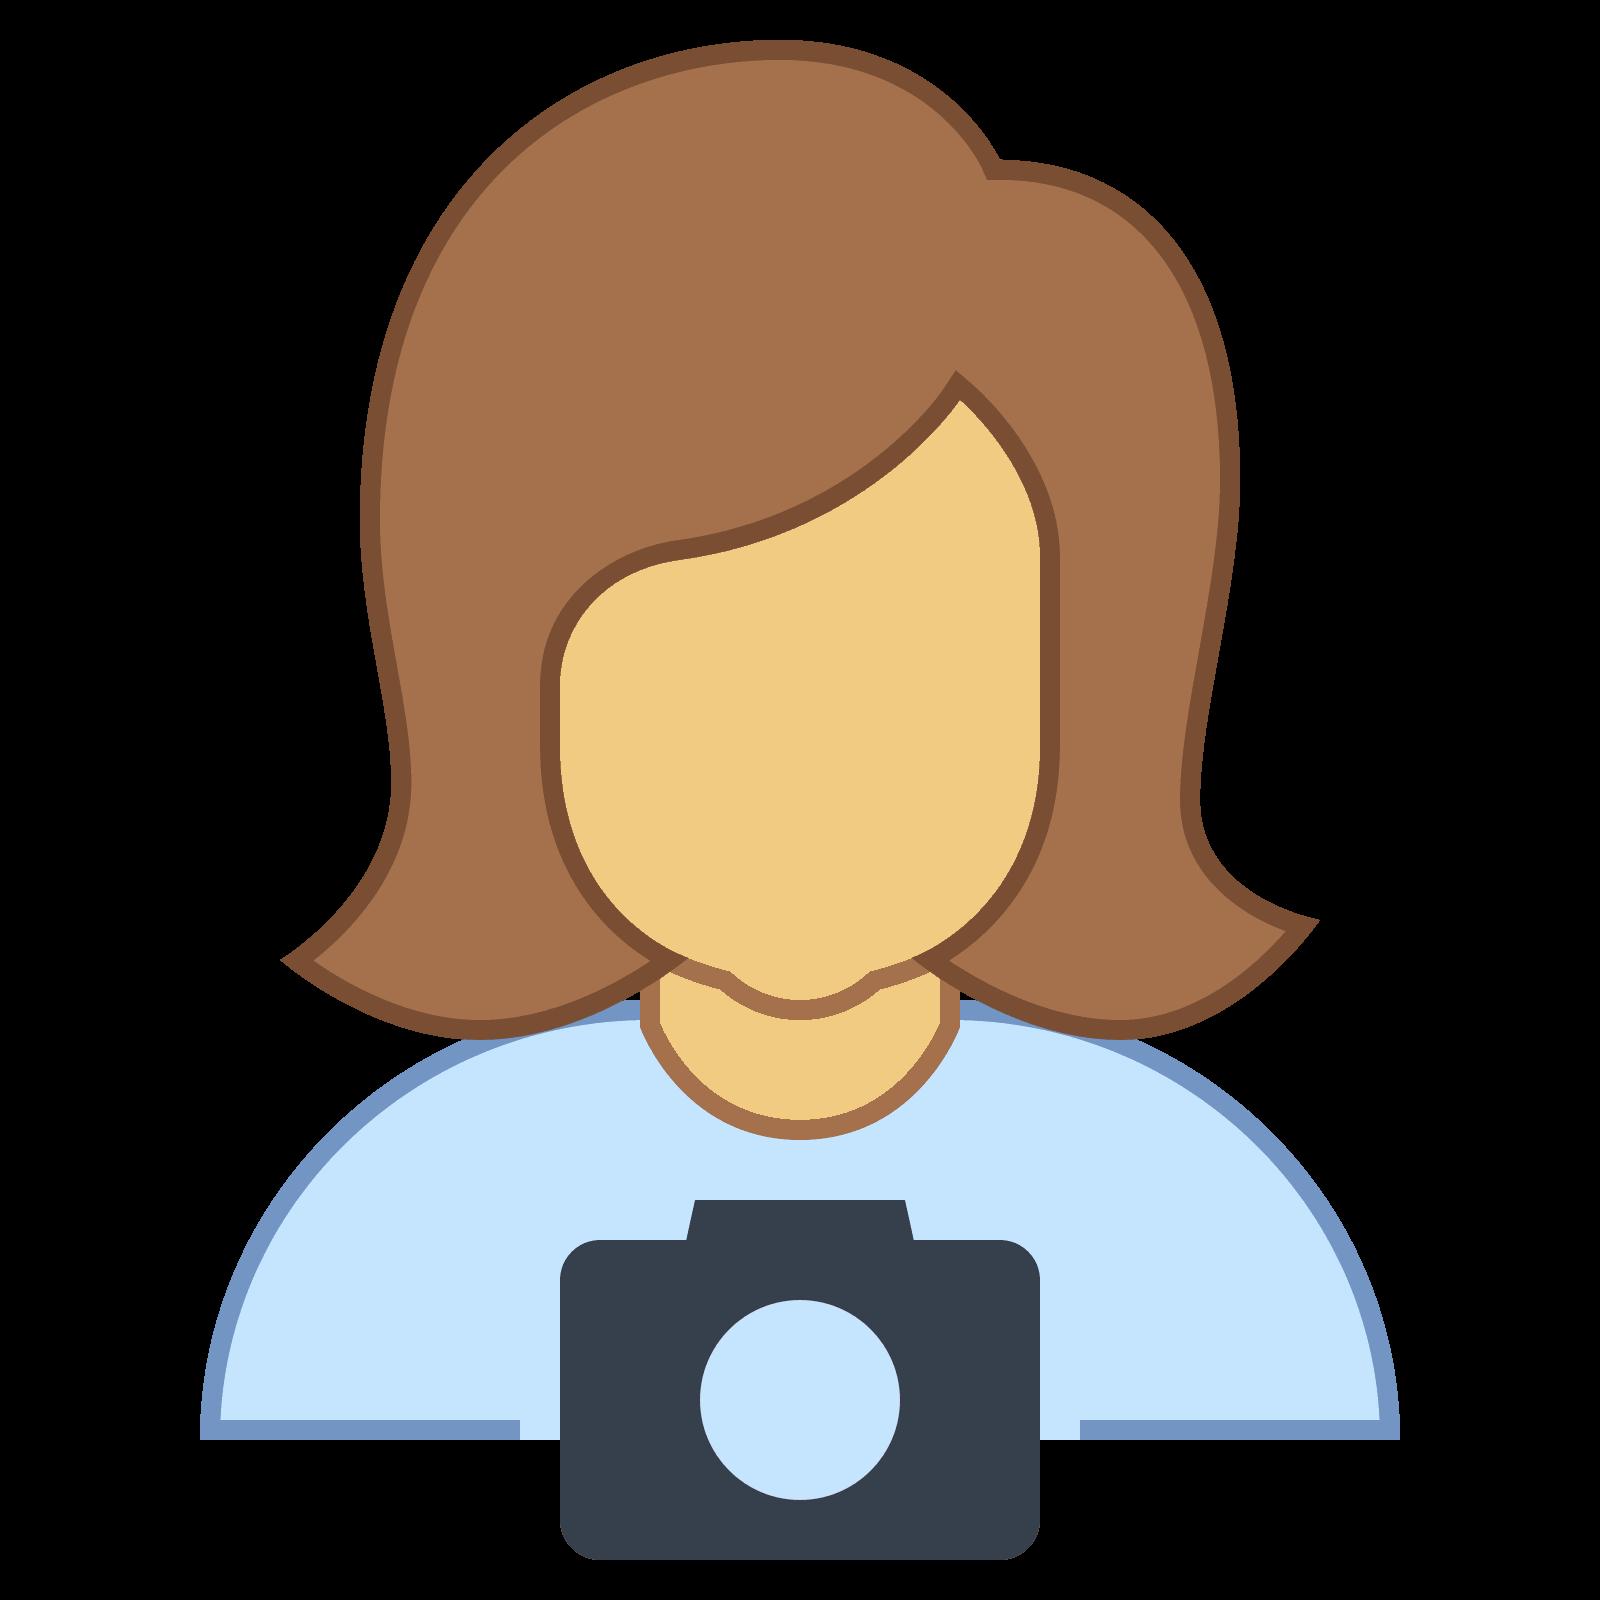 Tourism icon free download. Explorer clipart tourist guide